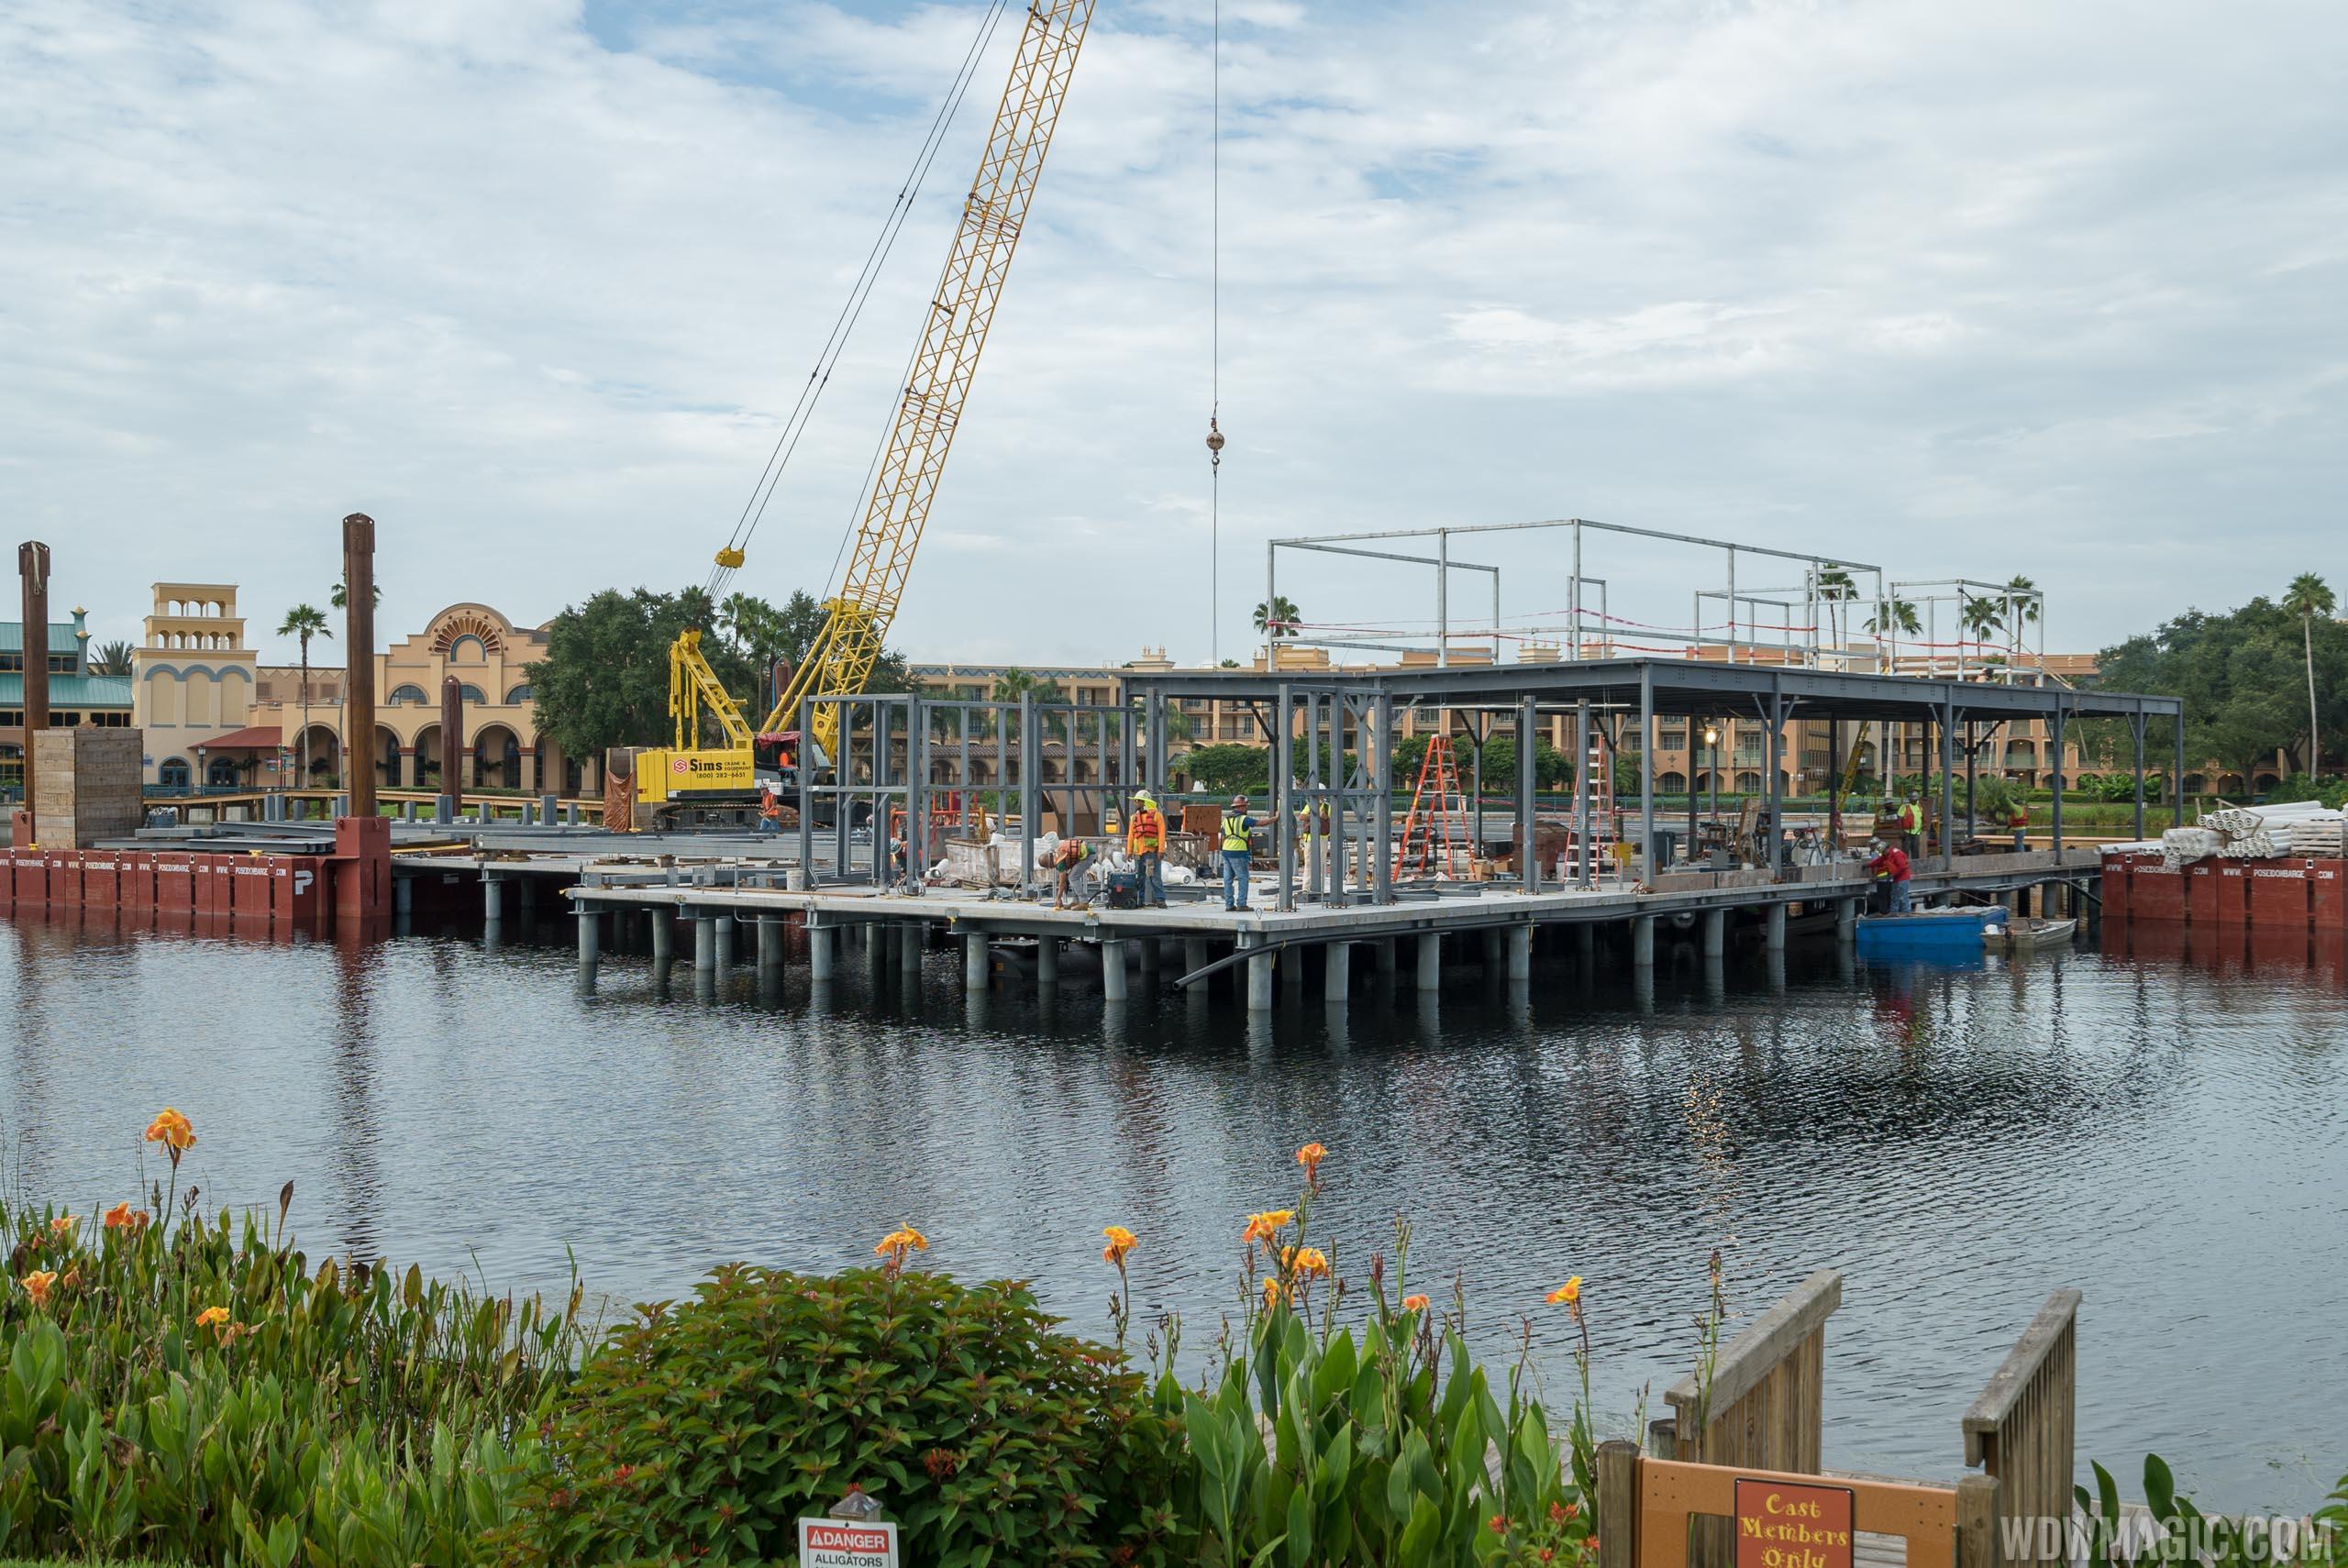 Lake Dorado restaurant construction - July 2018